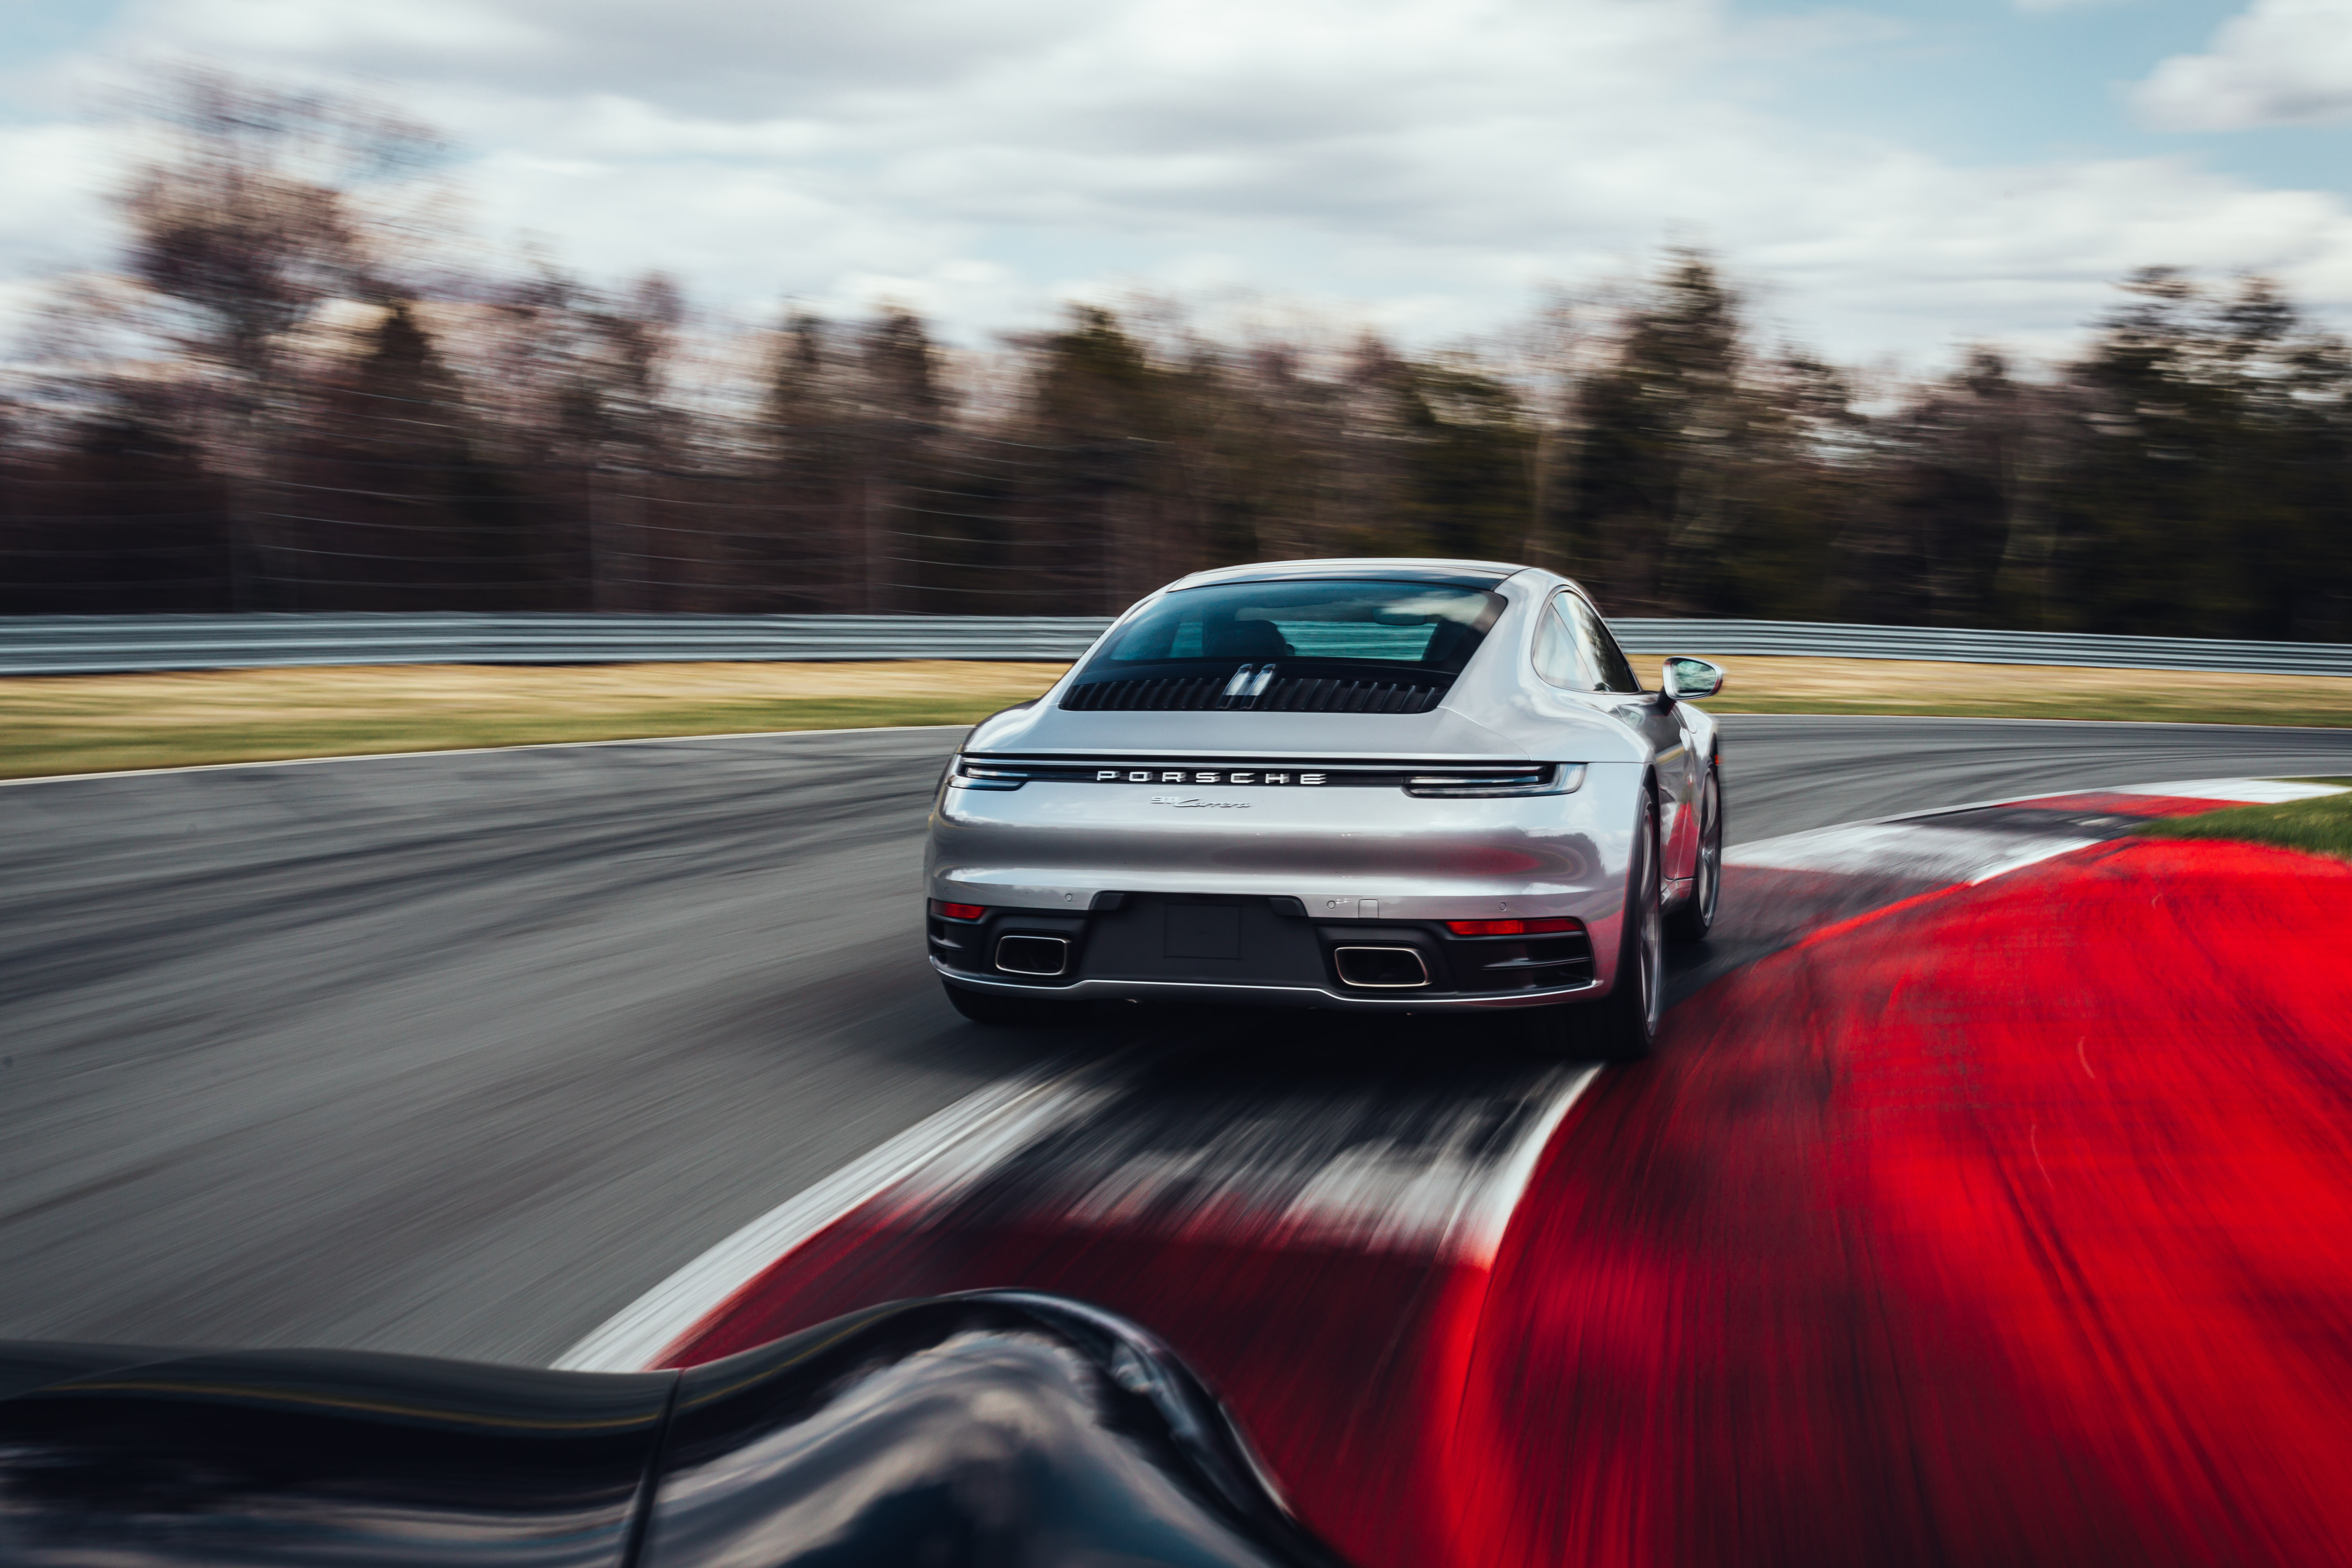 Porsche 911 at the Monticello Motor Club track.